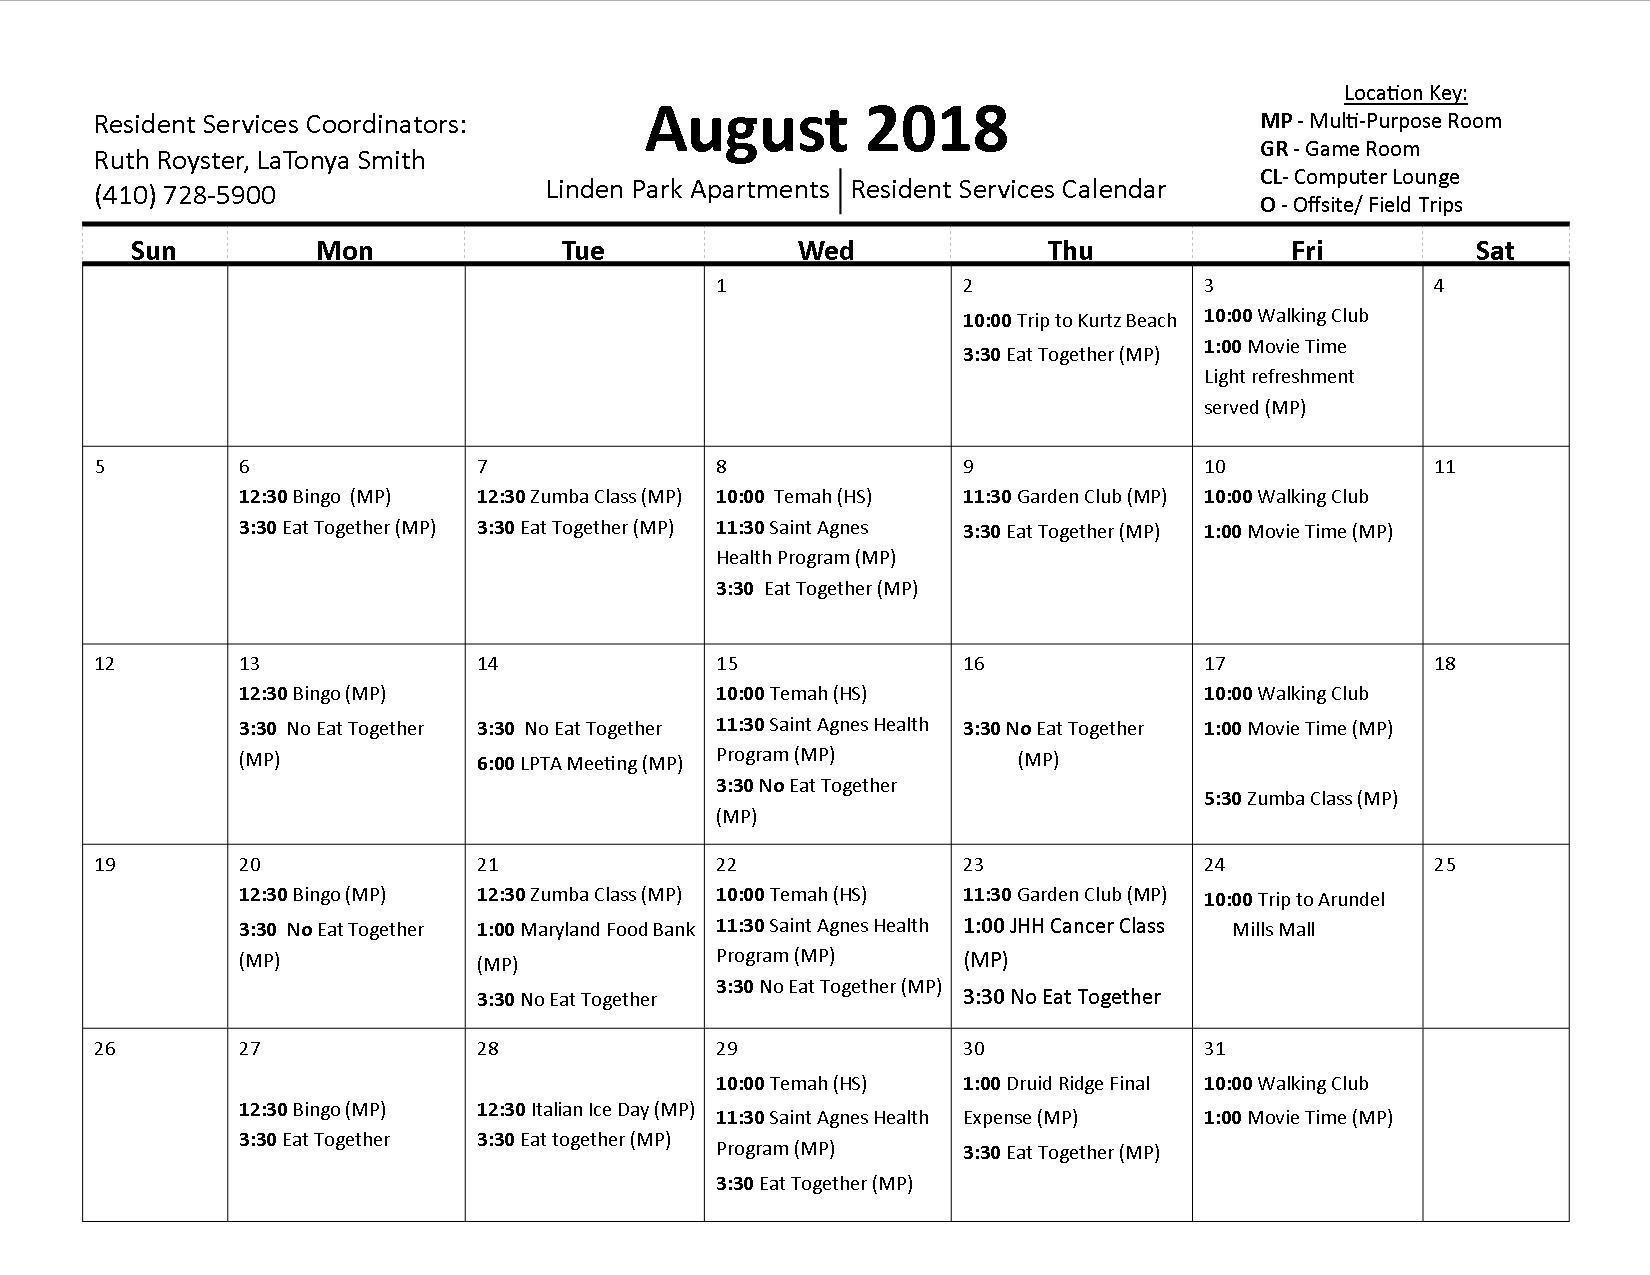 August 2018 Calender